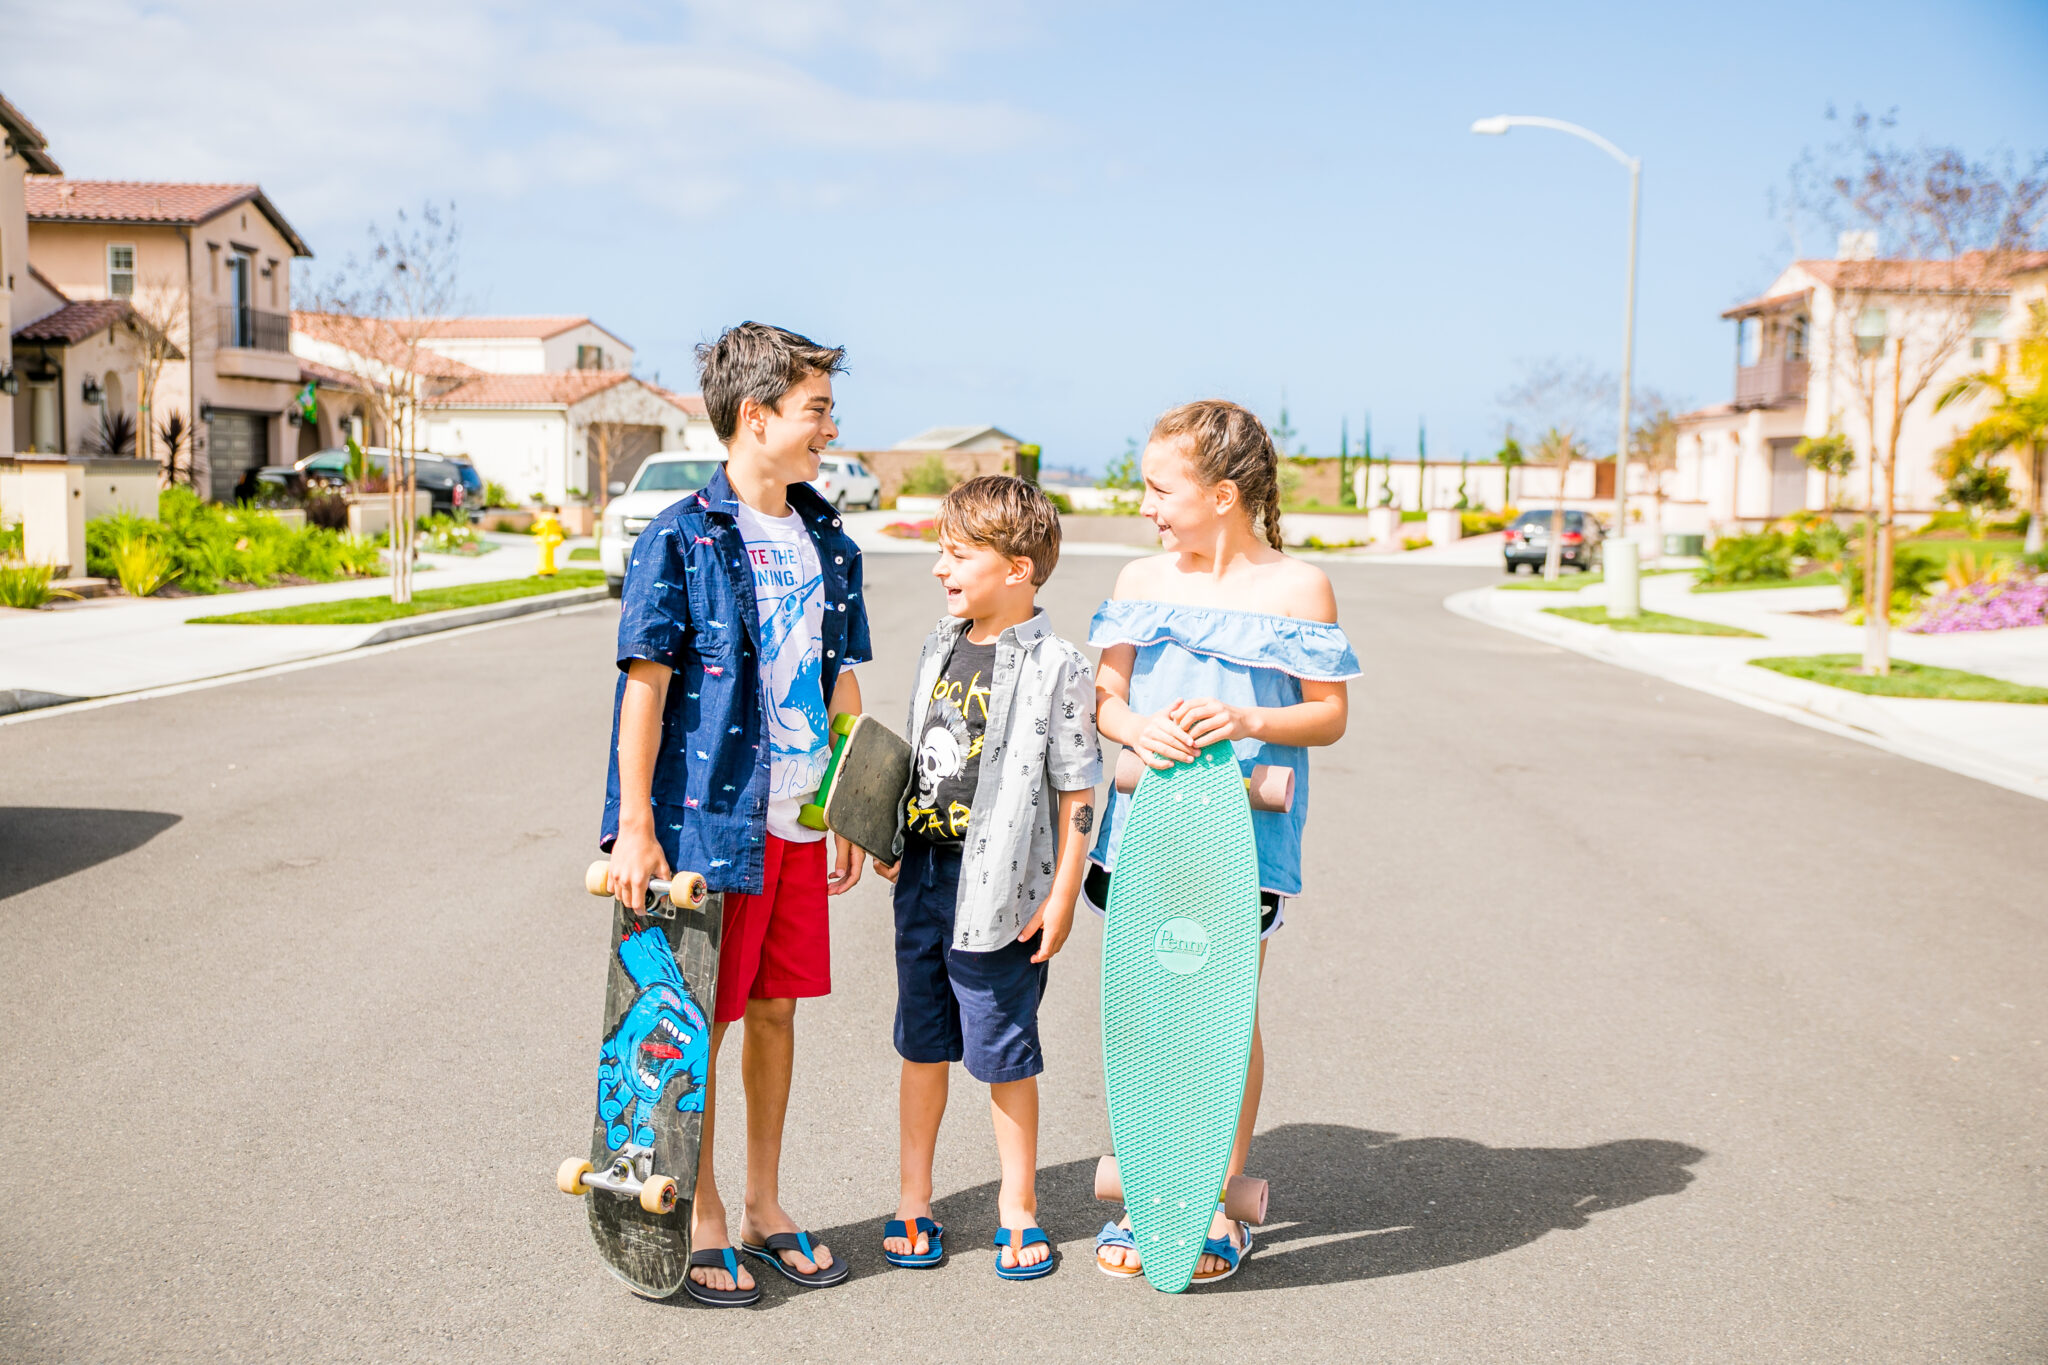 kids playing in the neighborhood